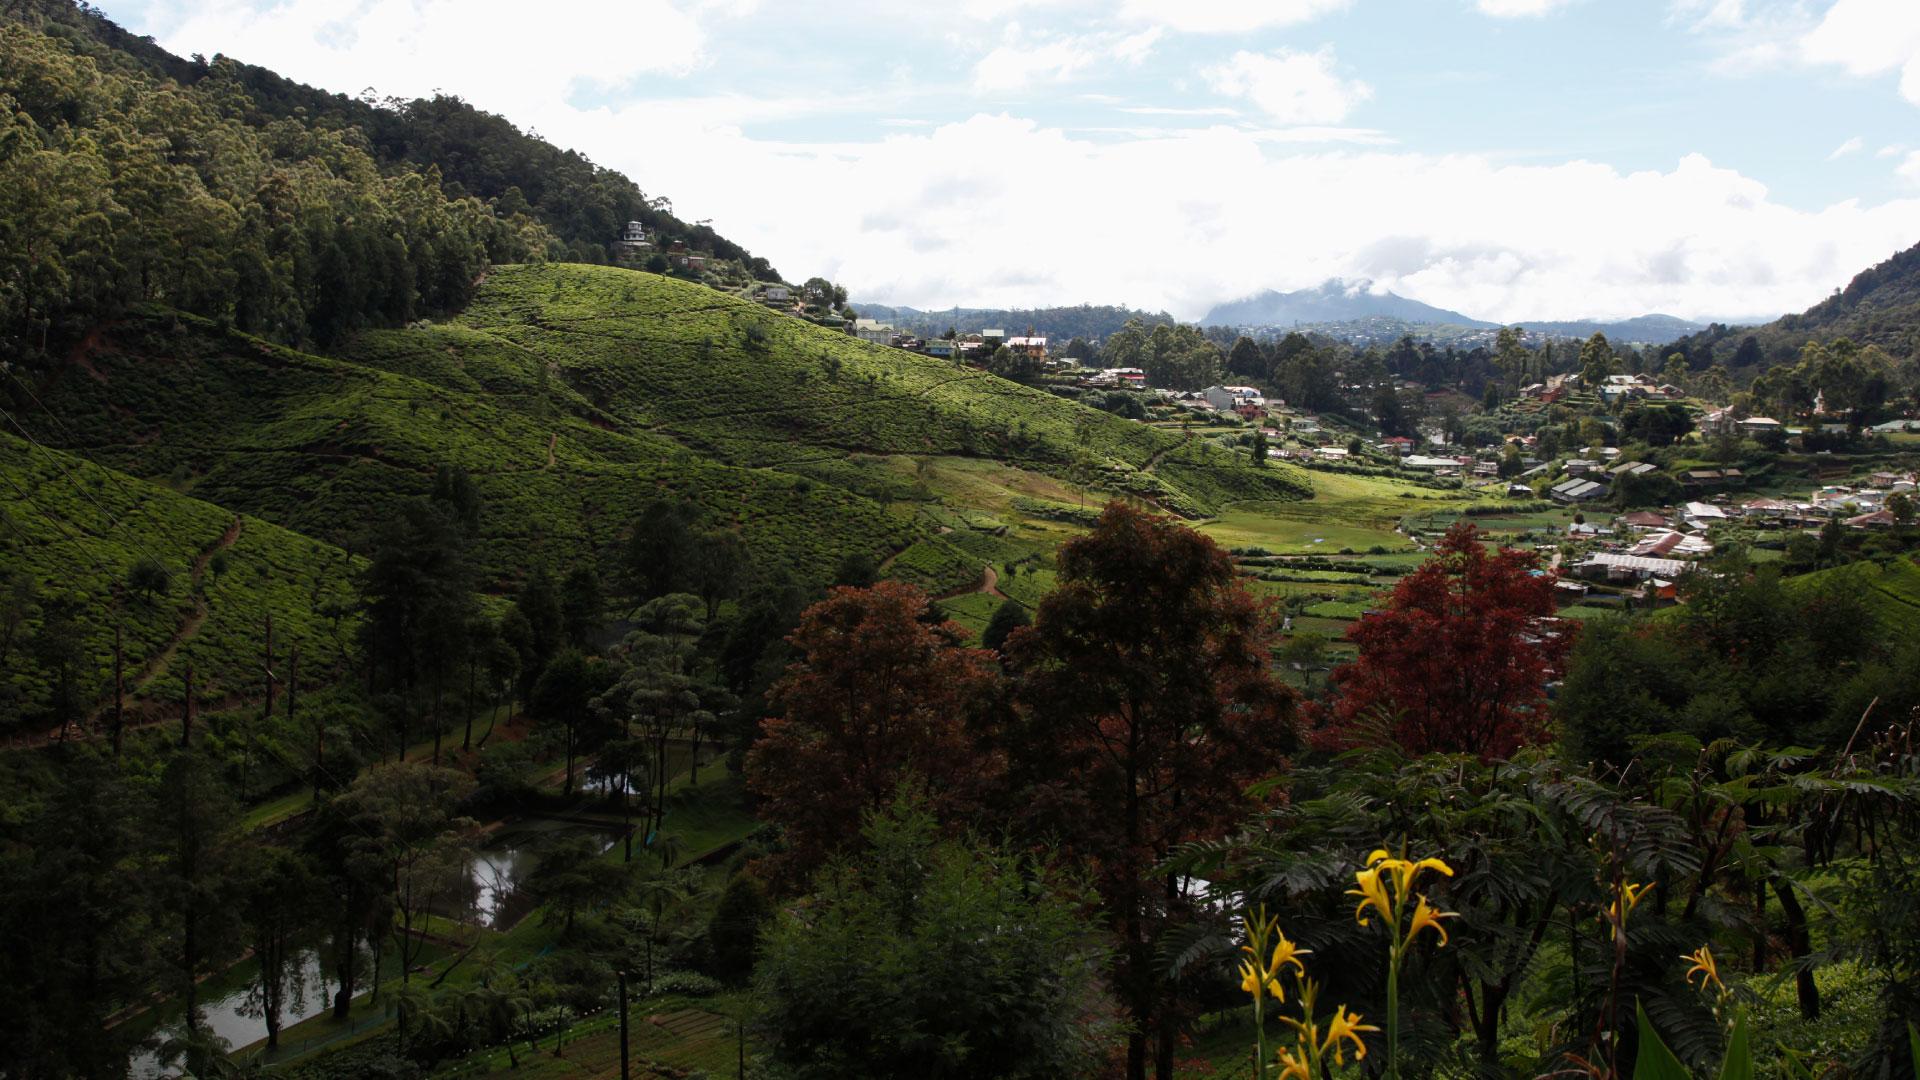 A photograph of hillside tea farms in Sri Lanka on a partly cloudy day.